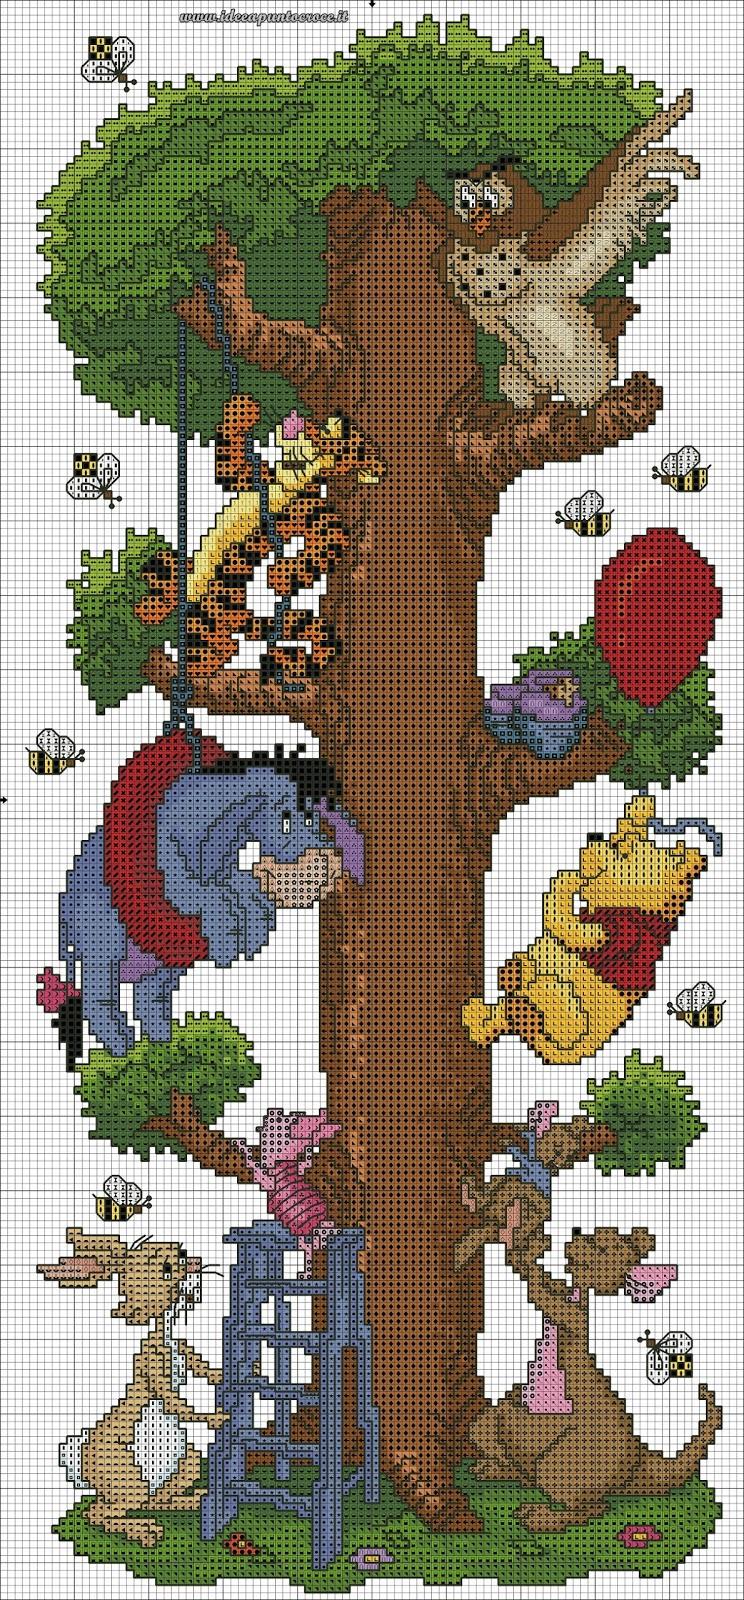 Schemi disney a punto croce schemi winnie the pooh for Winnie the pooh punto croce schemi